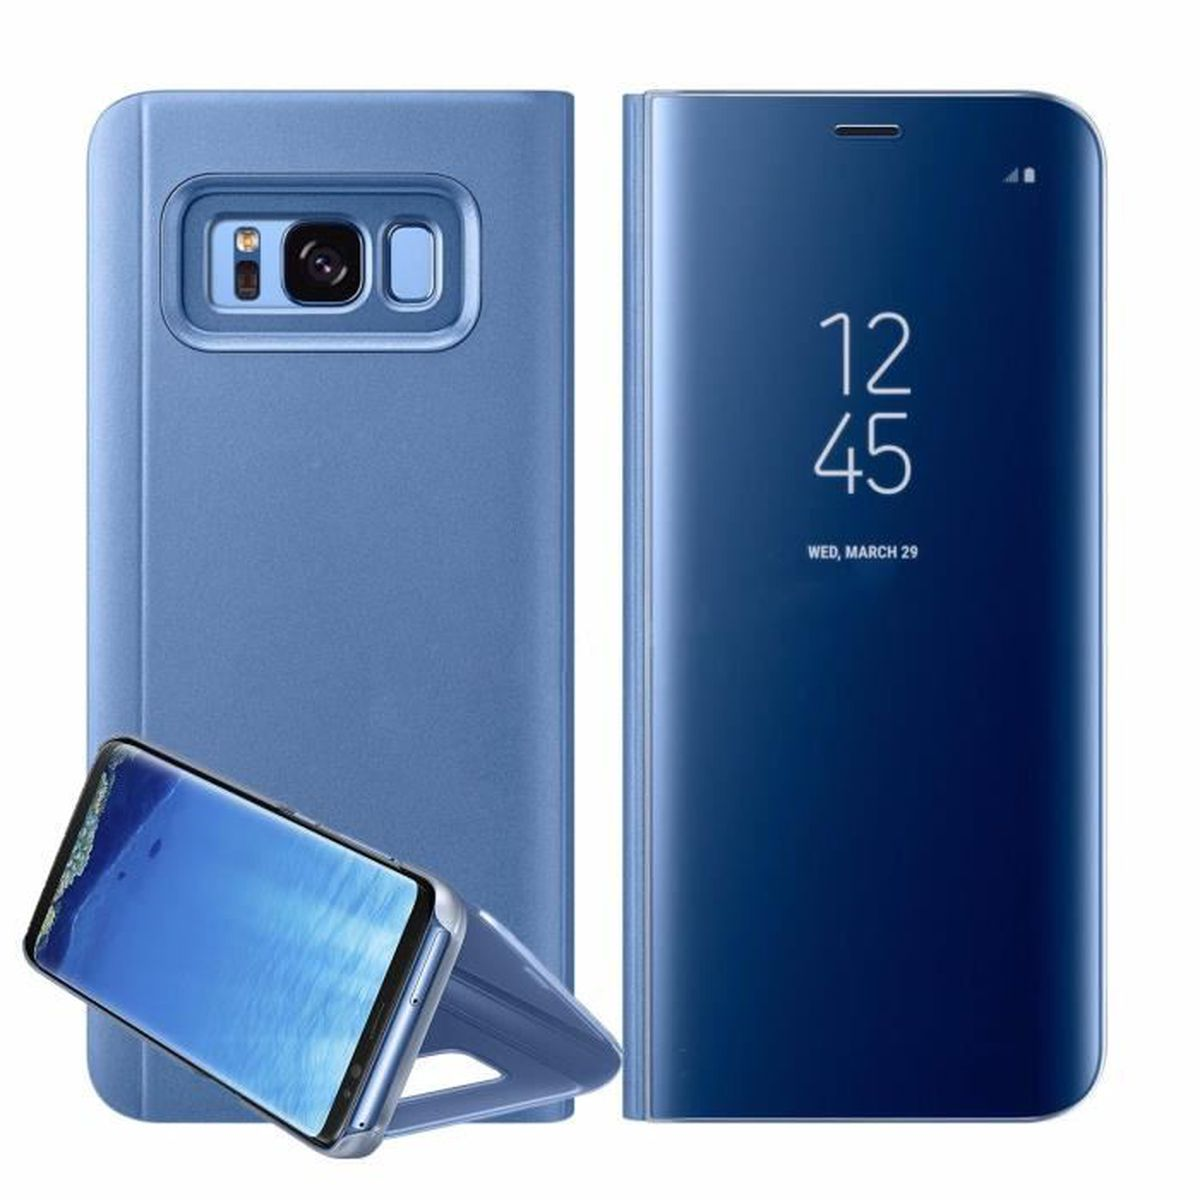 f26198b958 Samsung galaxy j4 bleu - Achat / Vente pas cher